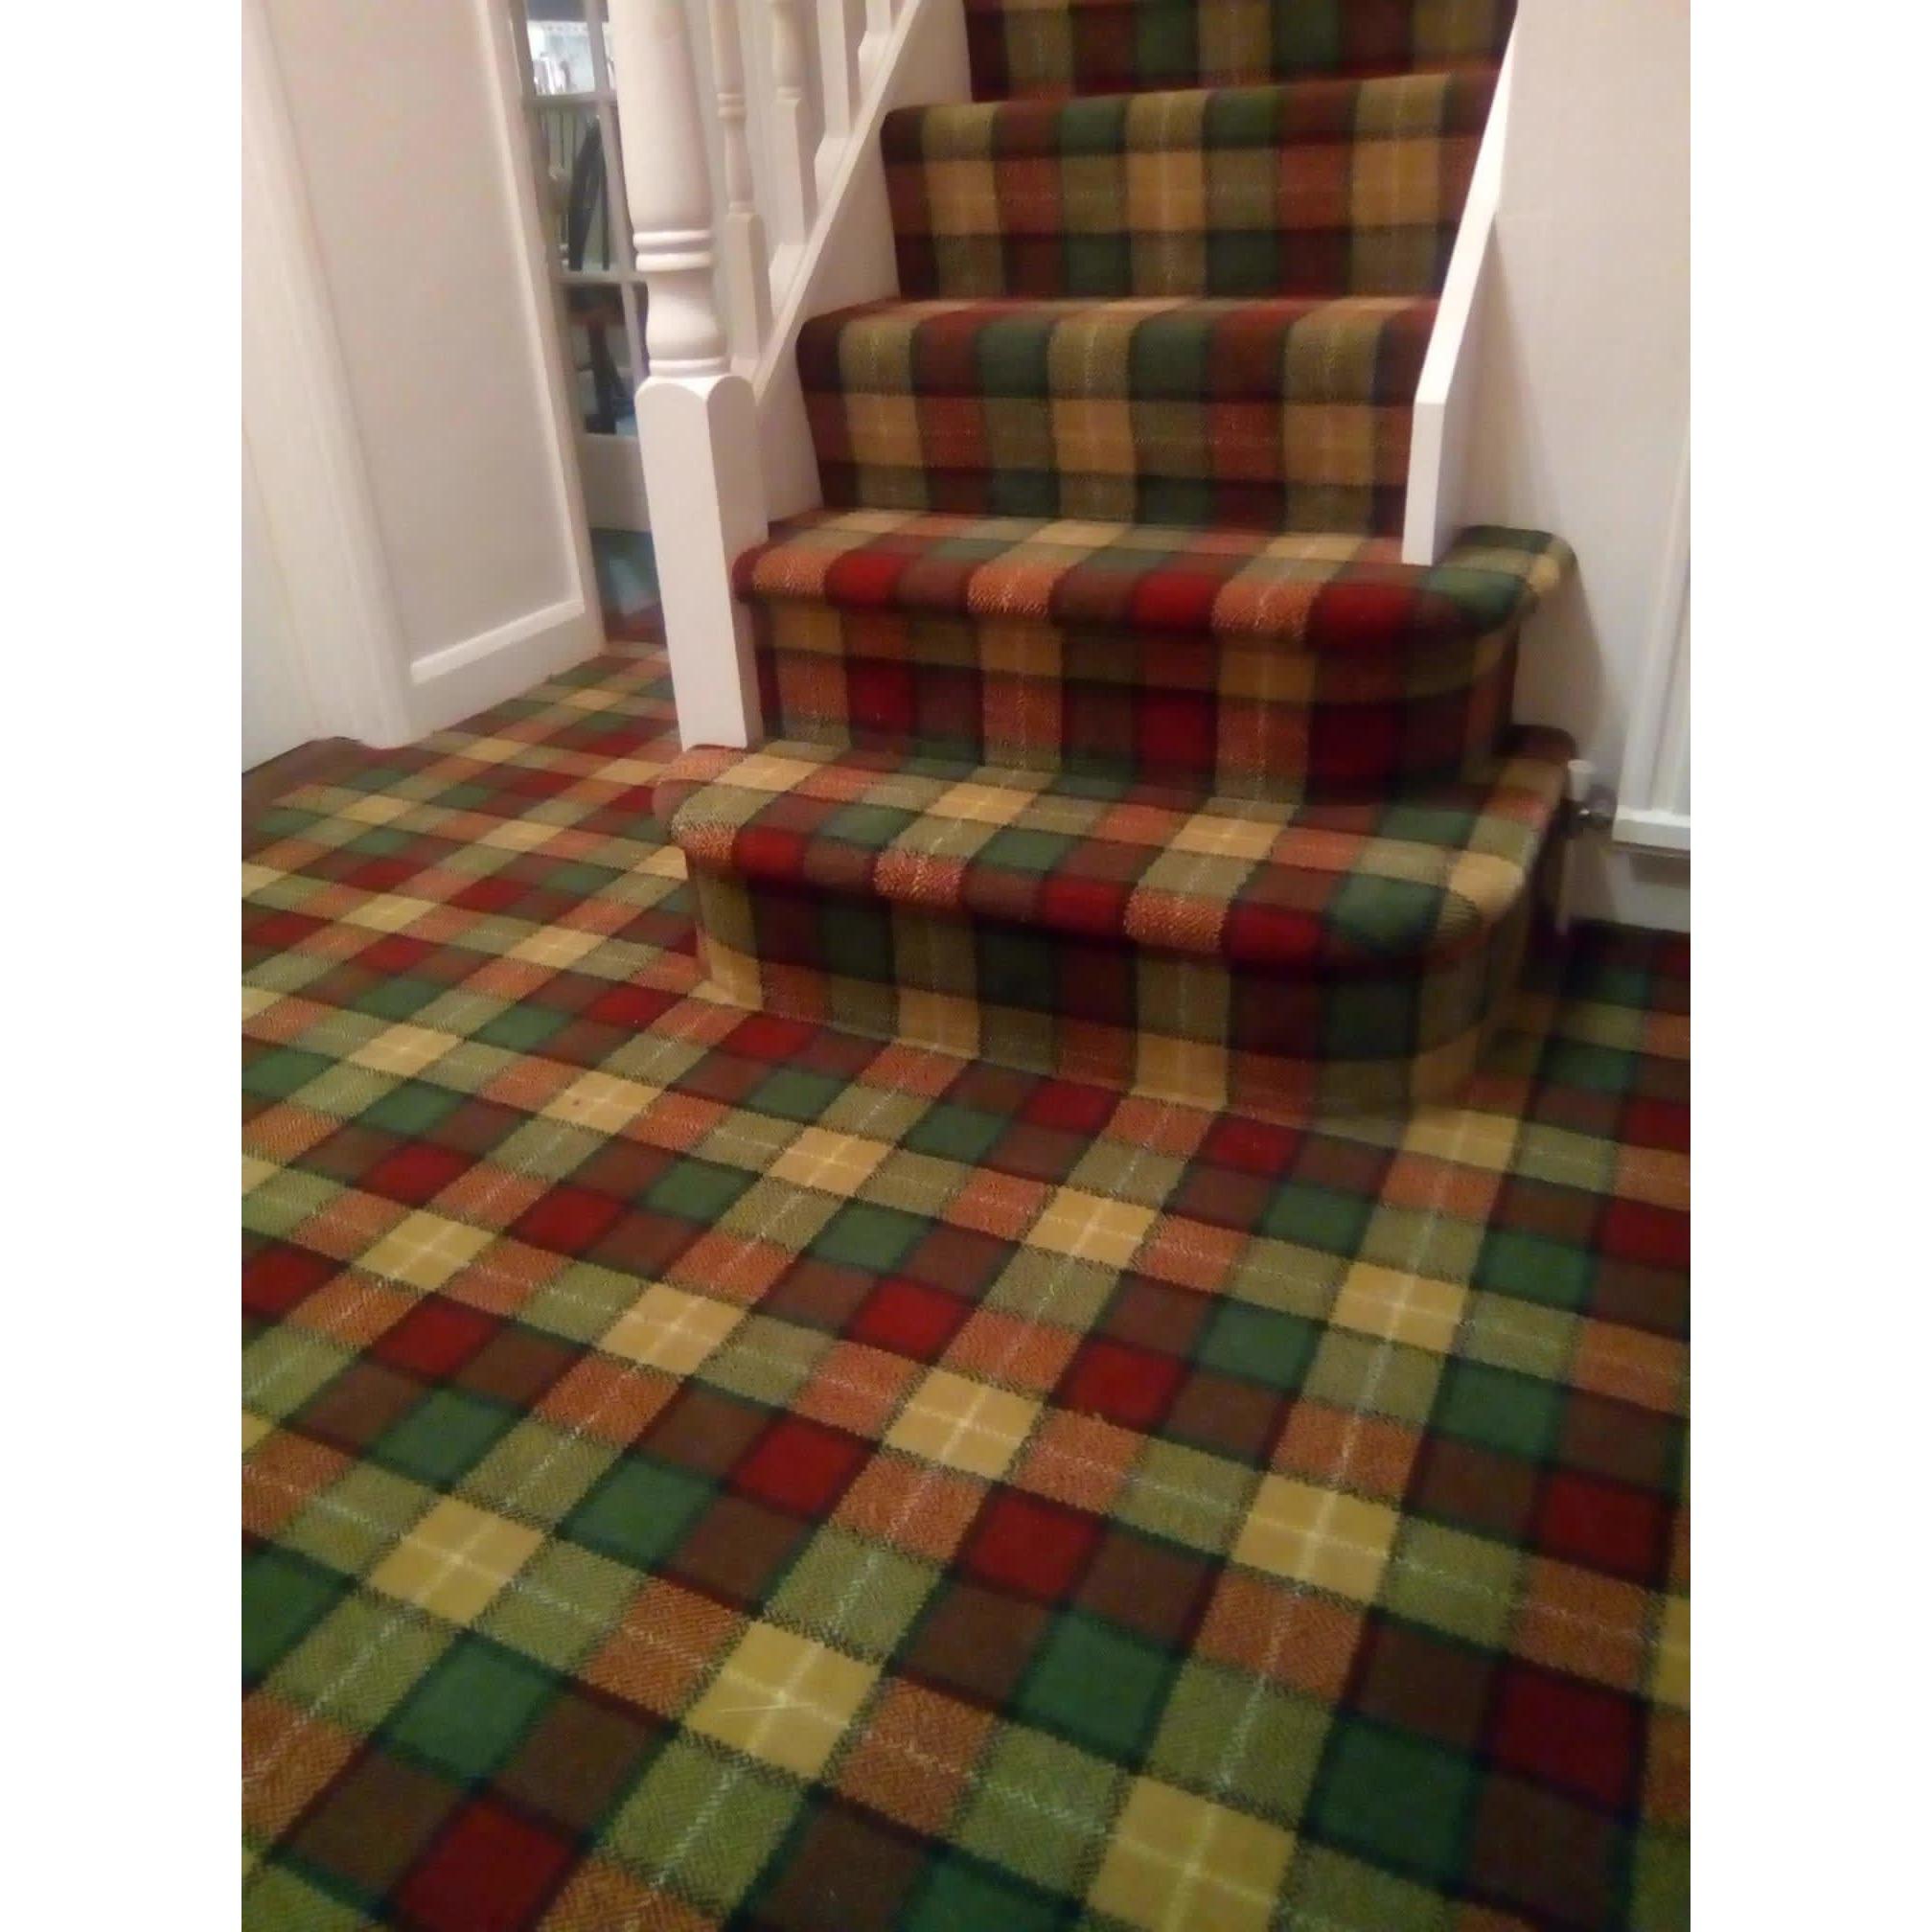 Lee Taylor Carpets & Flooring - Exmouth, Devon EX8 1TL - 07527 895191 | ShowMeLocal.com